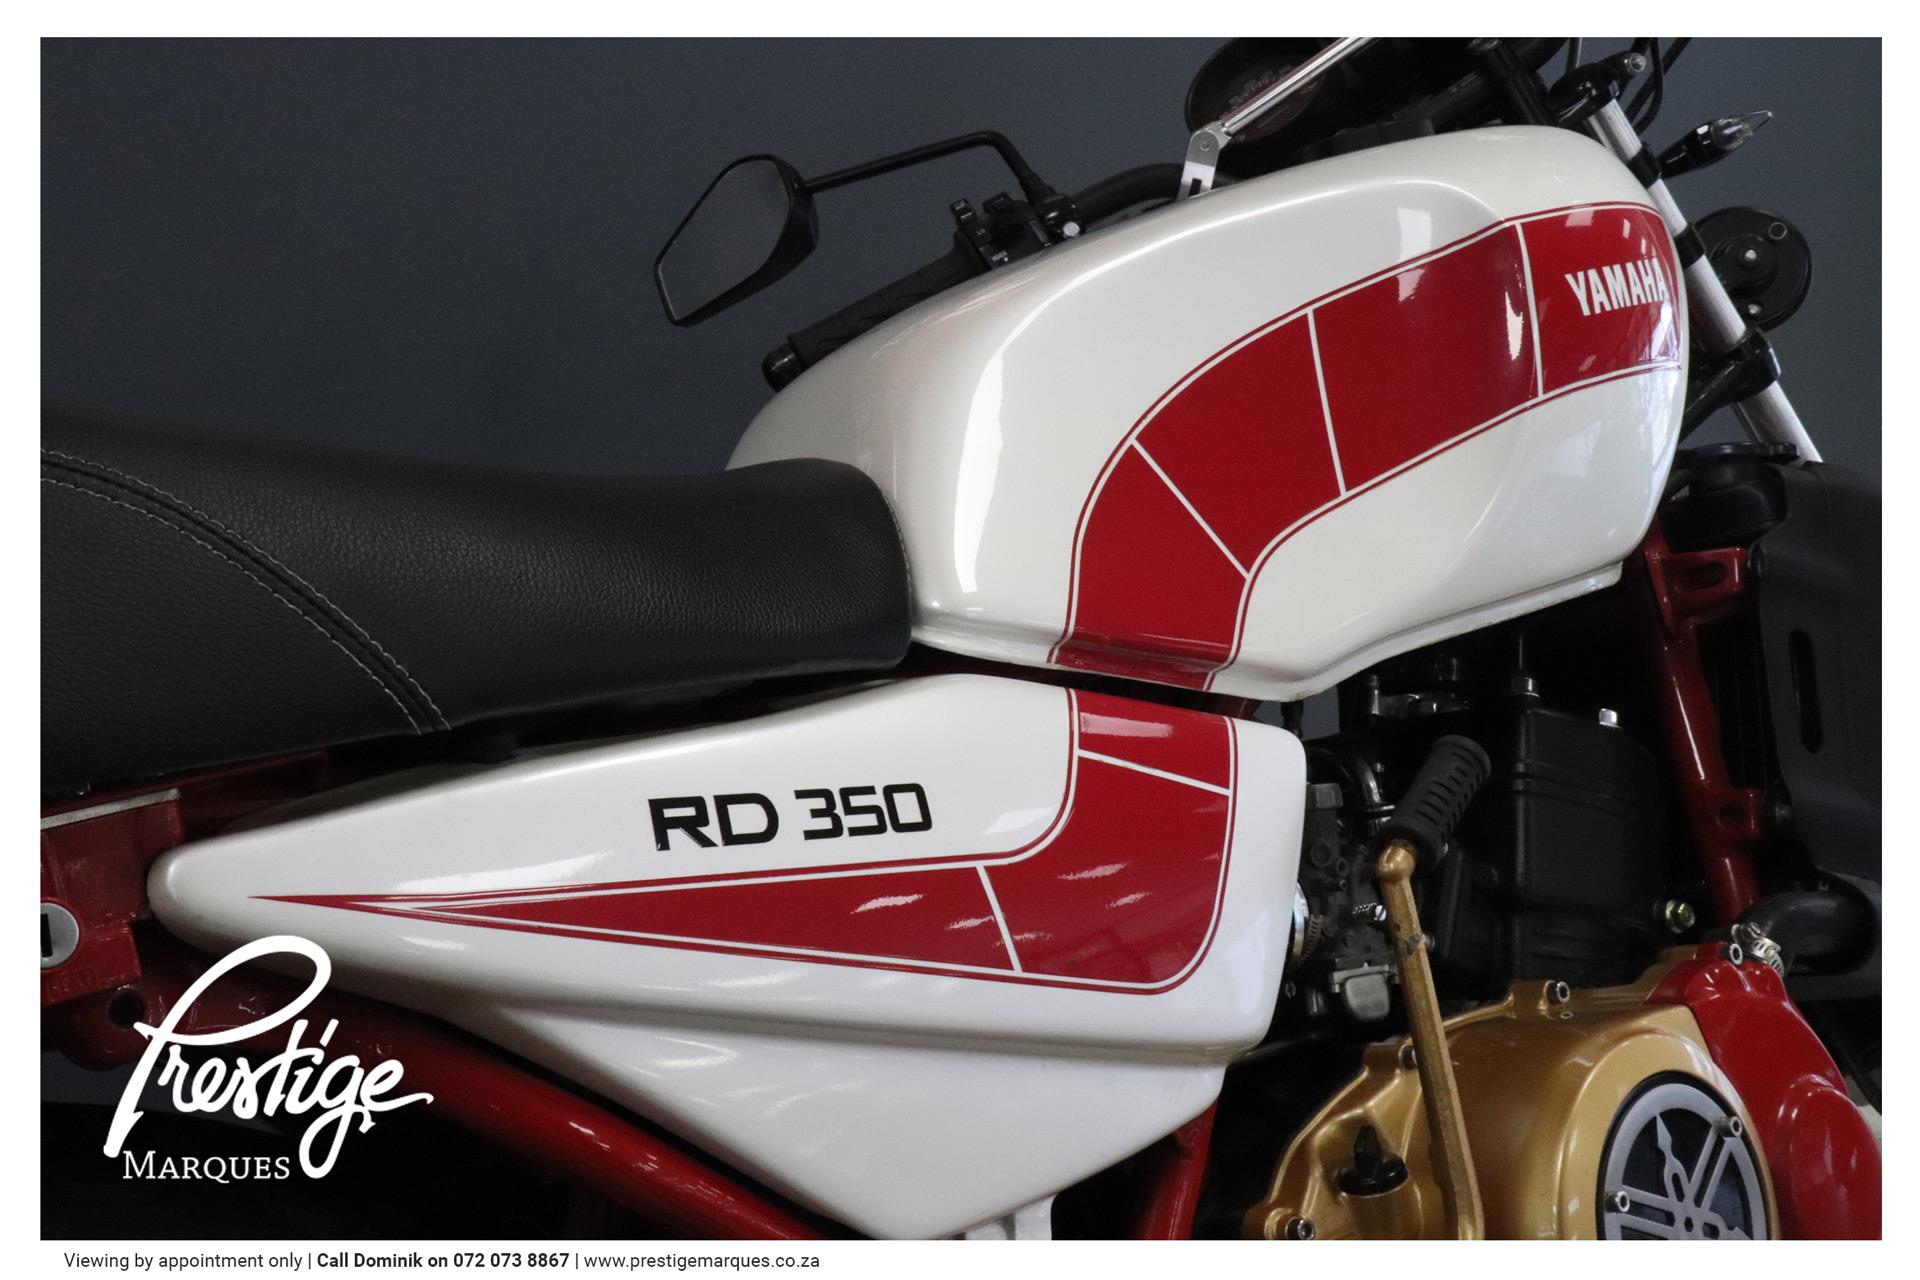 Prestige-Marques-Yamaha-RD-350-3